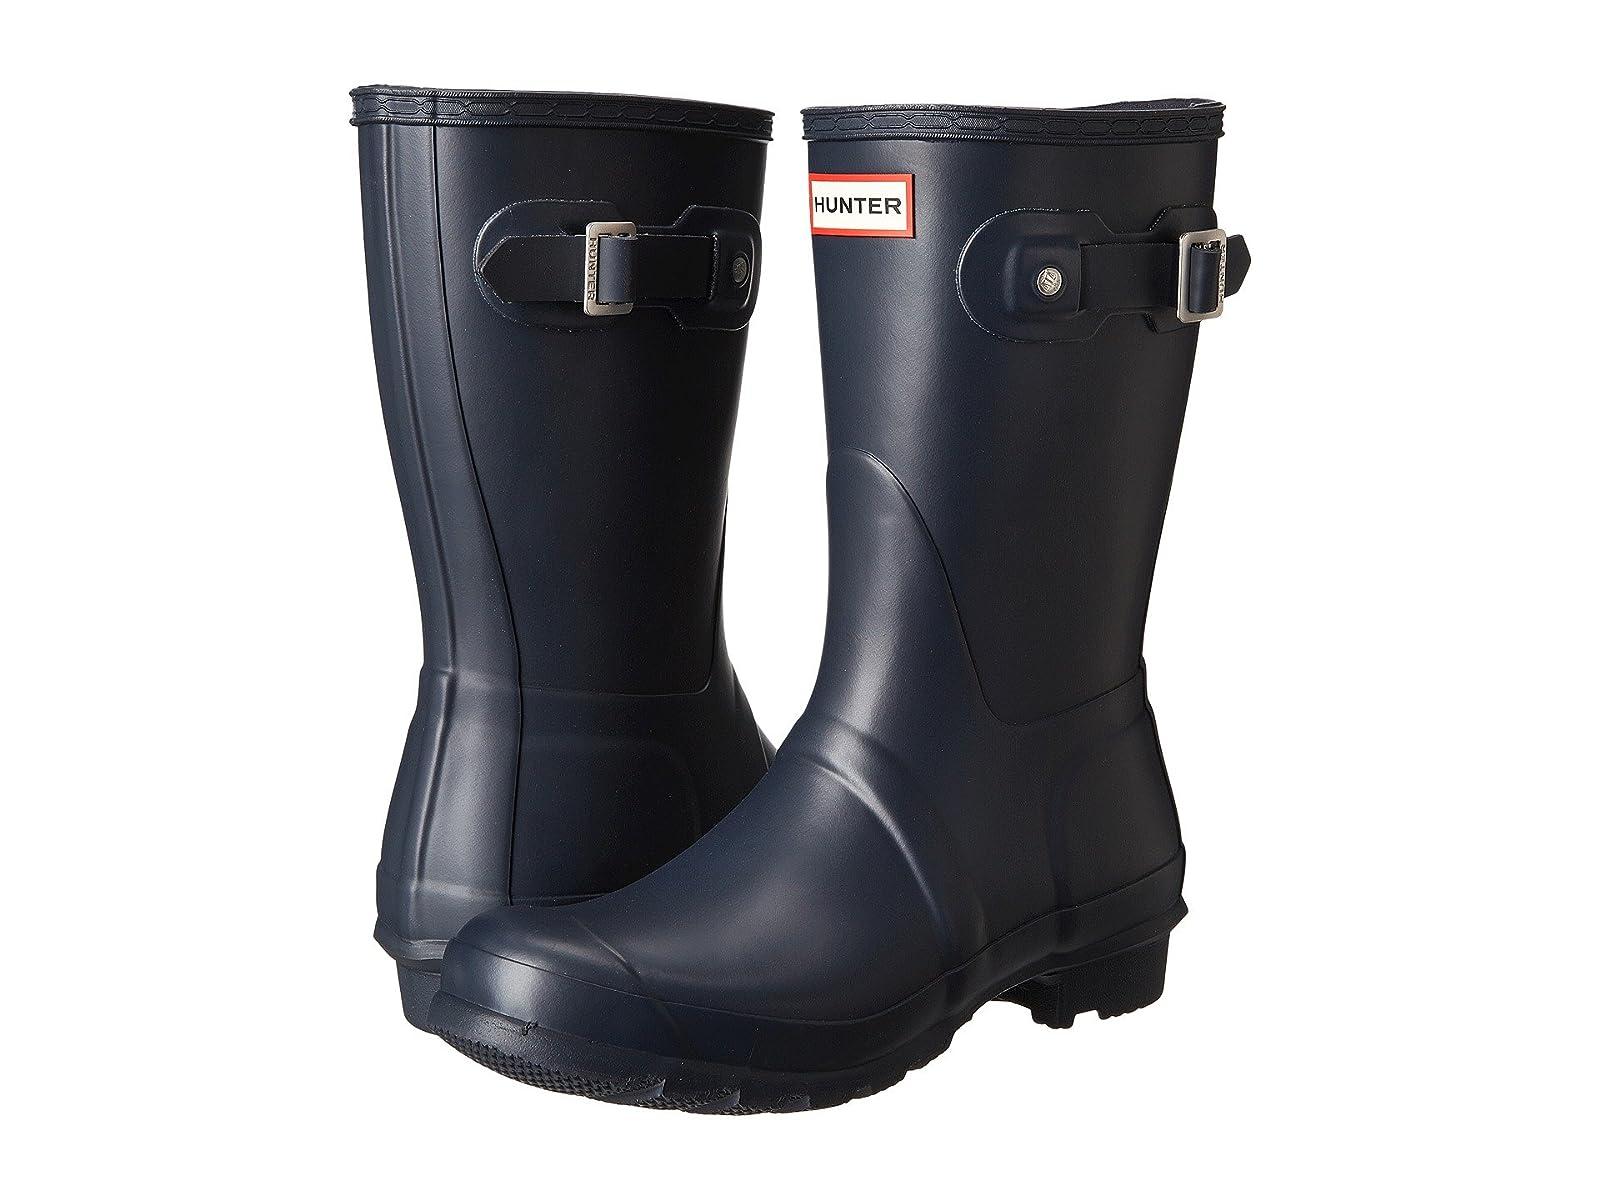 Hunter Original Short Rain BootsAffordable and distinctive shoes